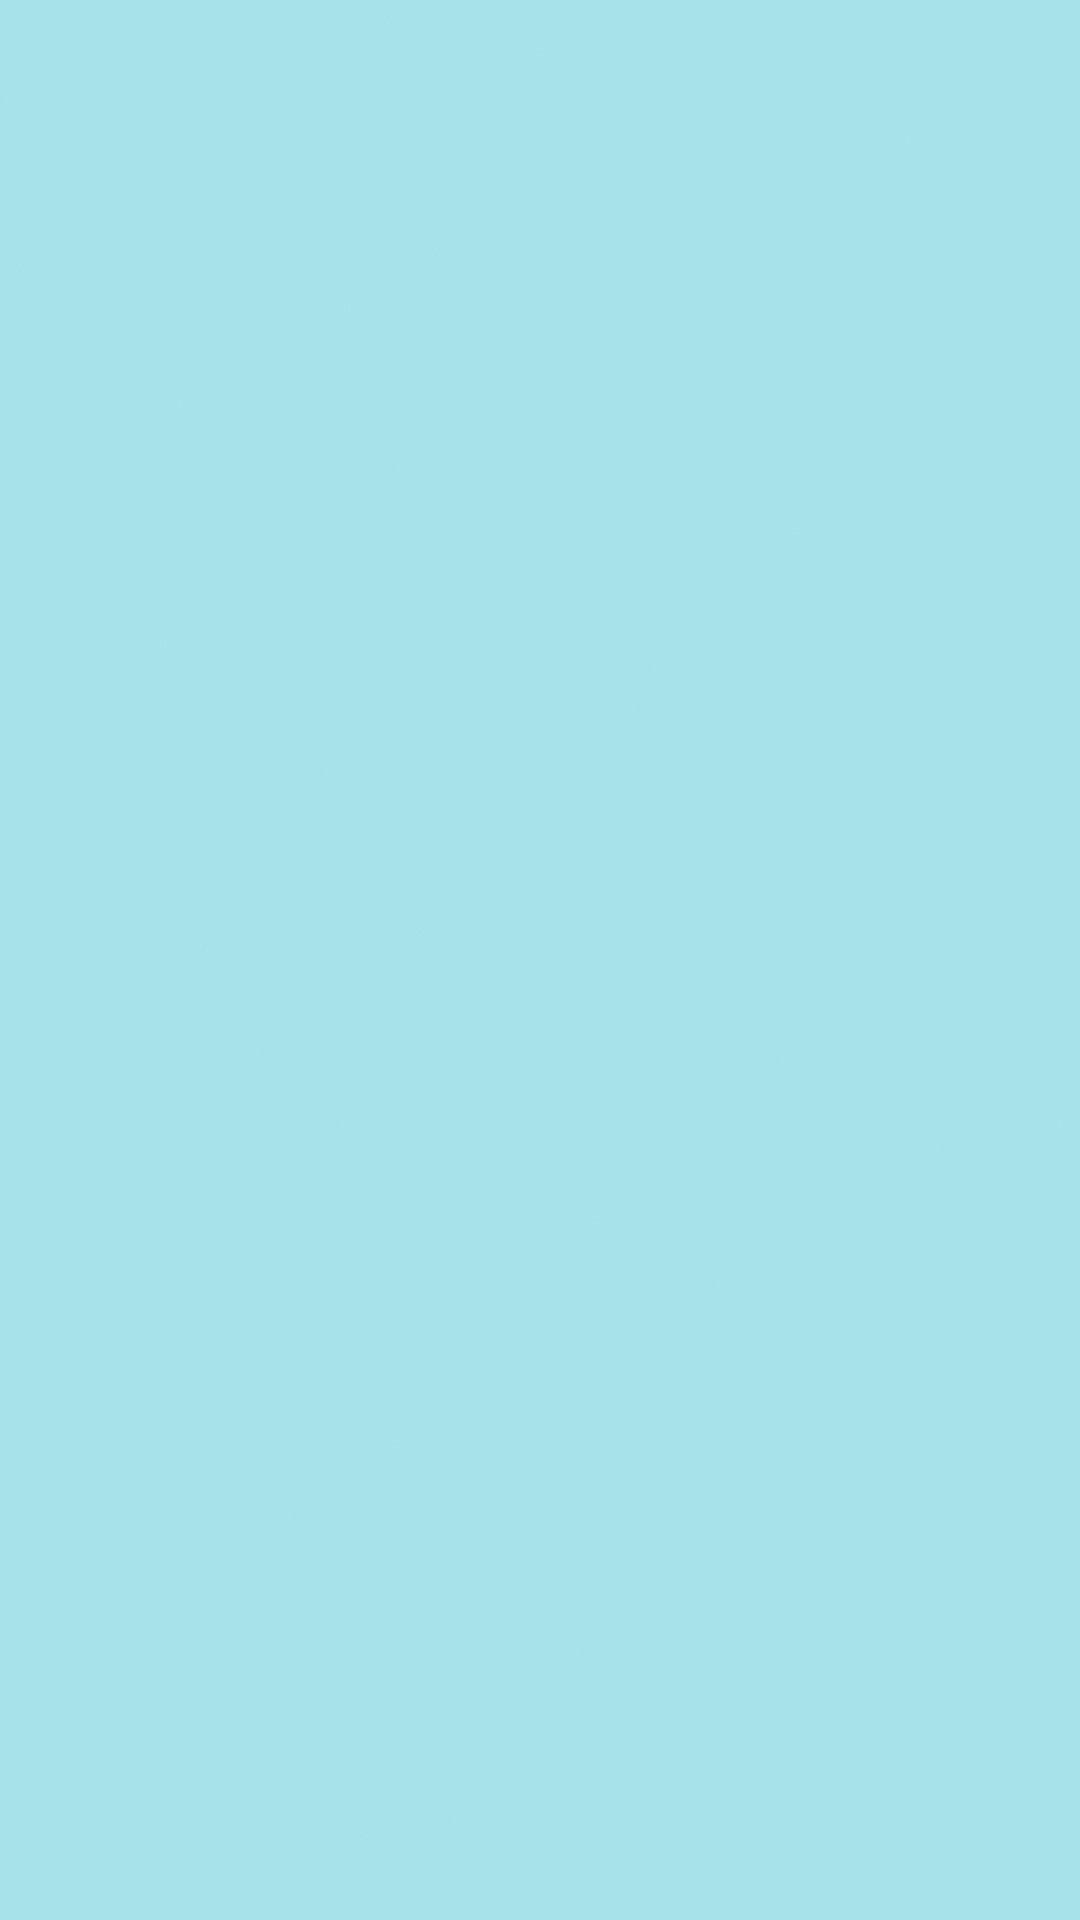 Azul pastel liso